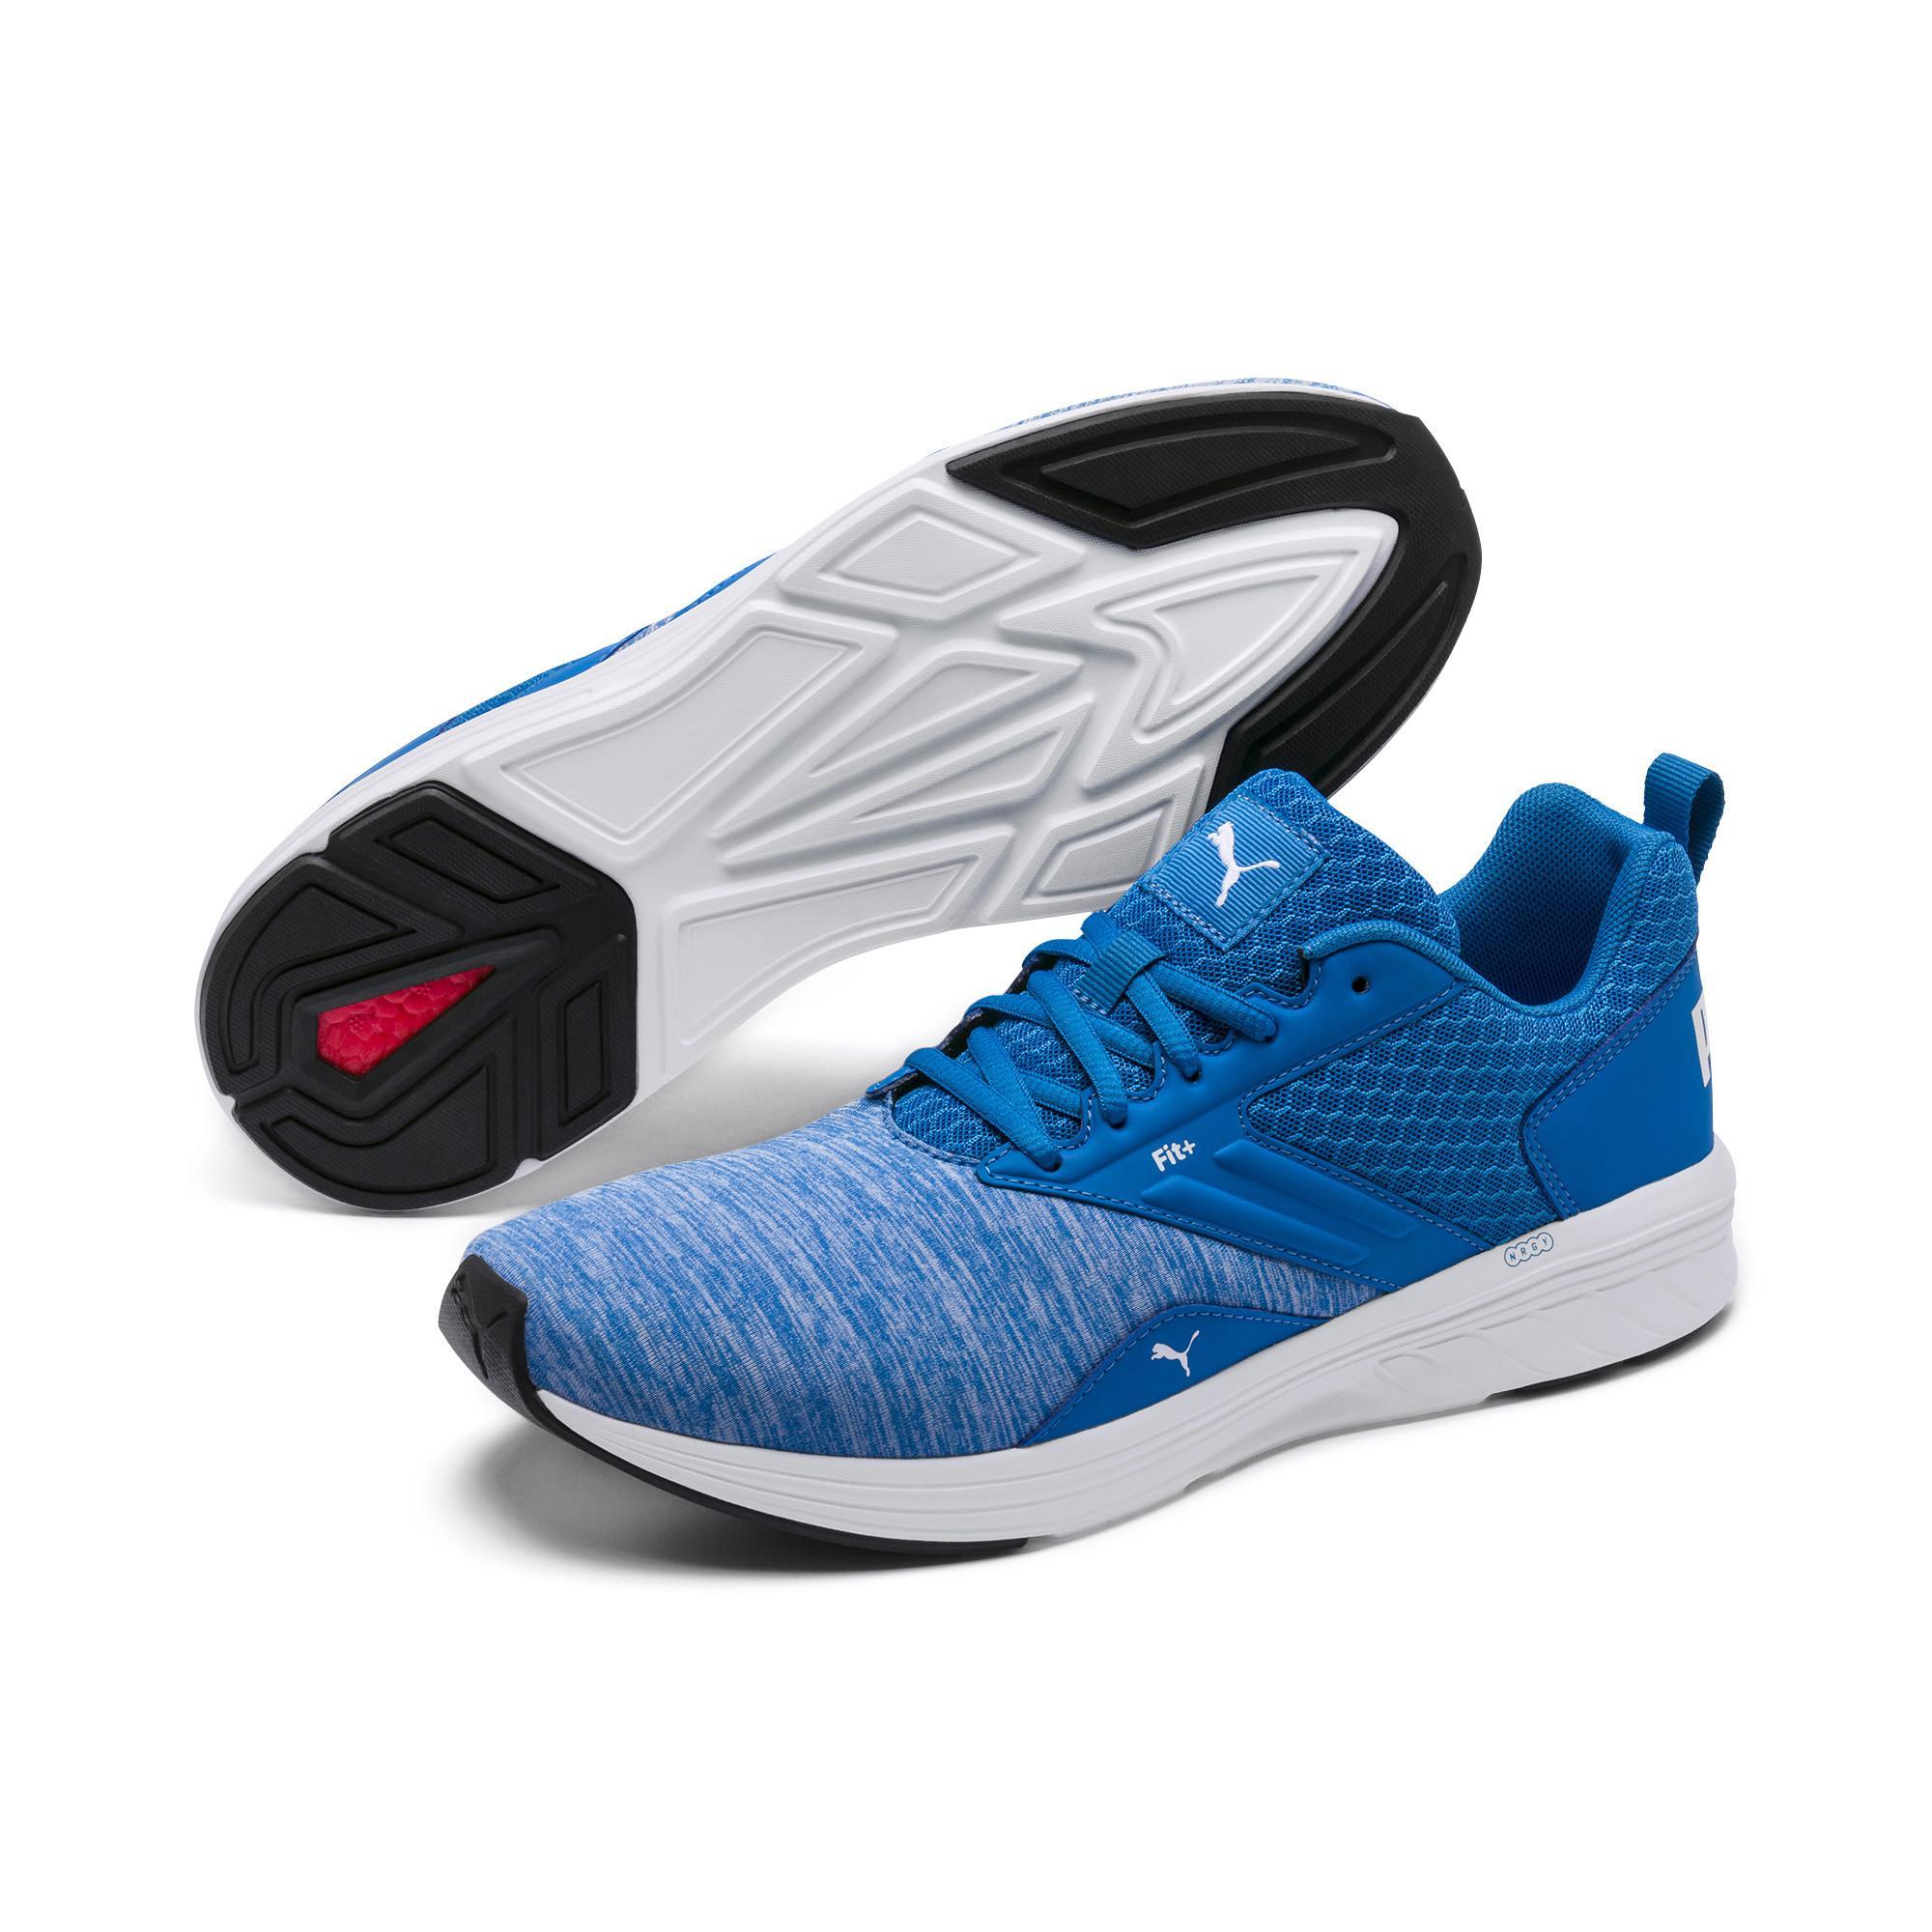 c11cf2ac22af28 PUMA - Blue Nrgy Comet Running Shoes for Men - Lyst. View fullscreen